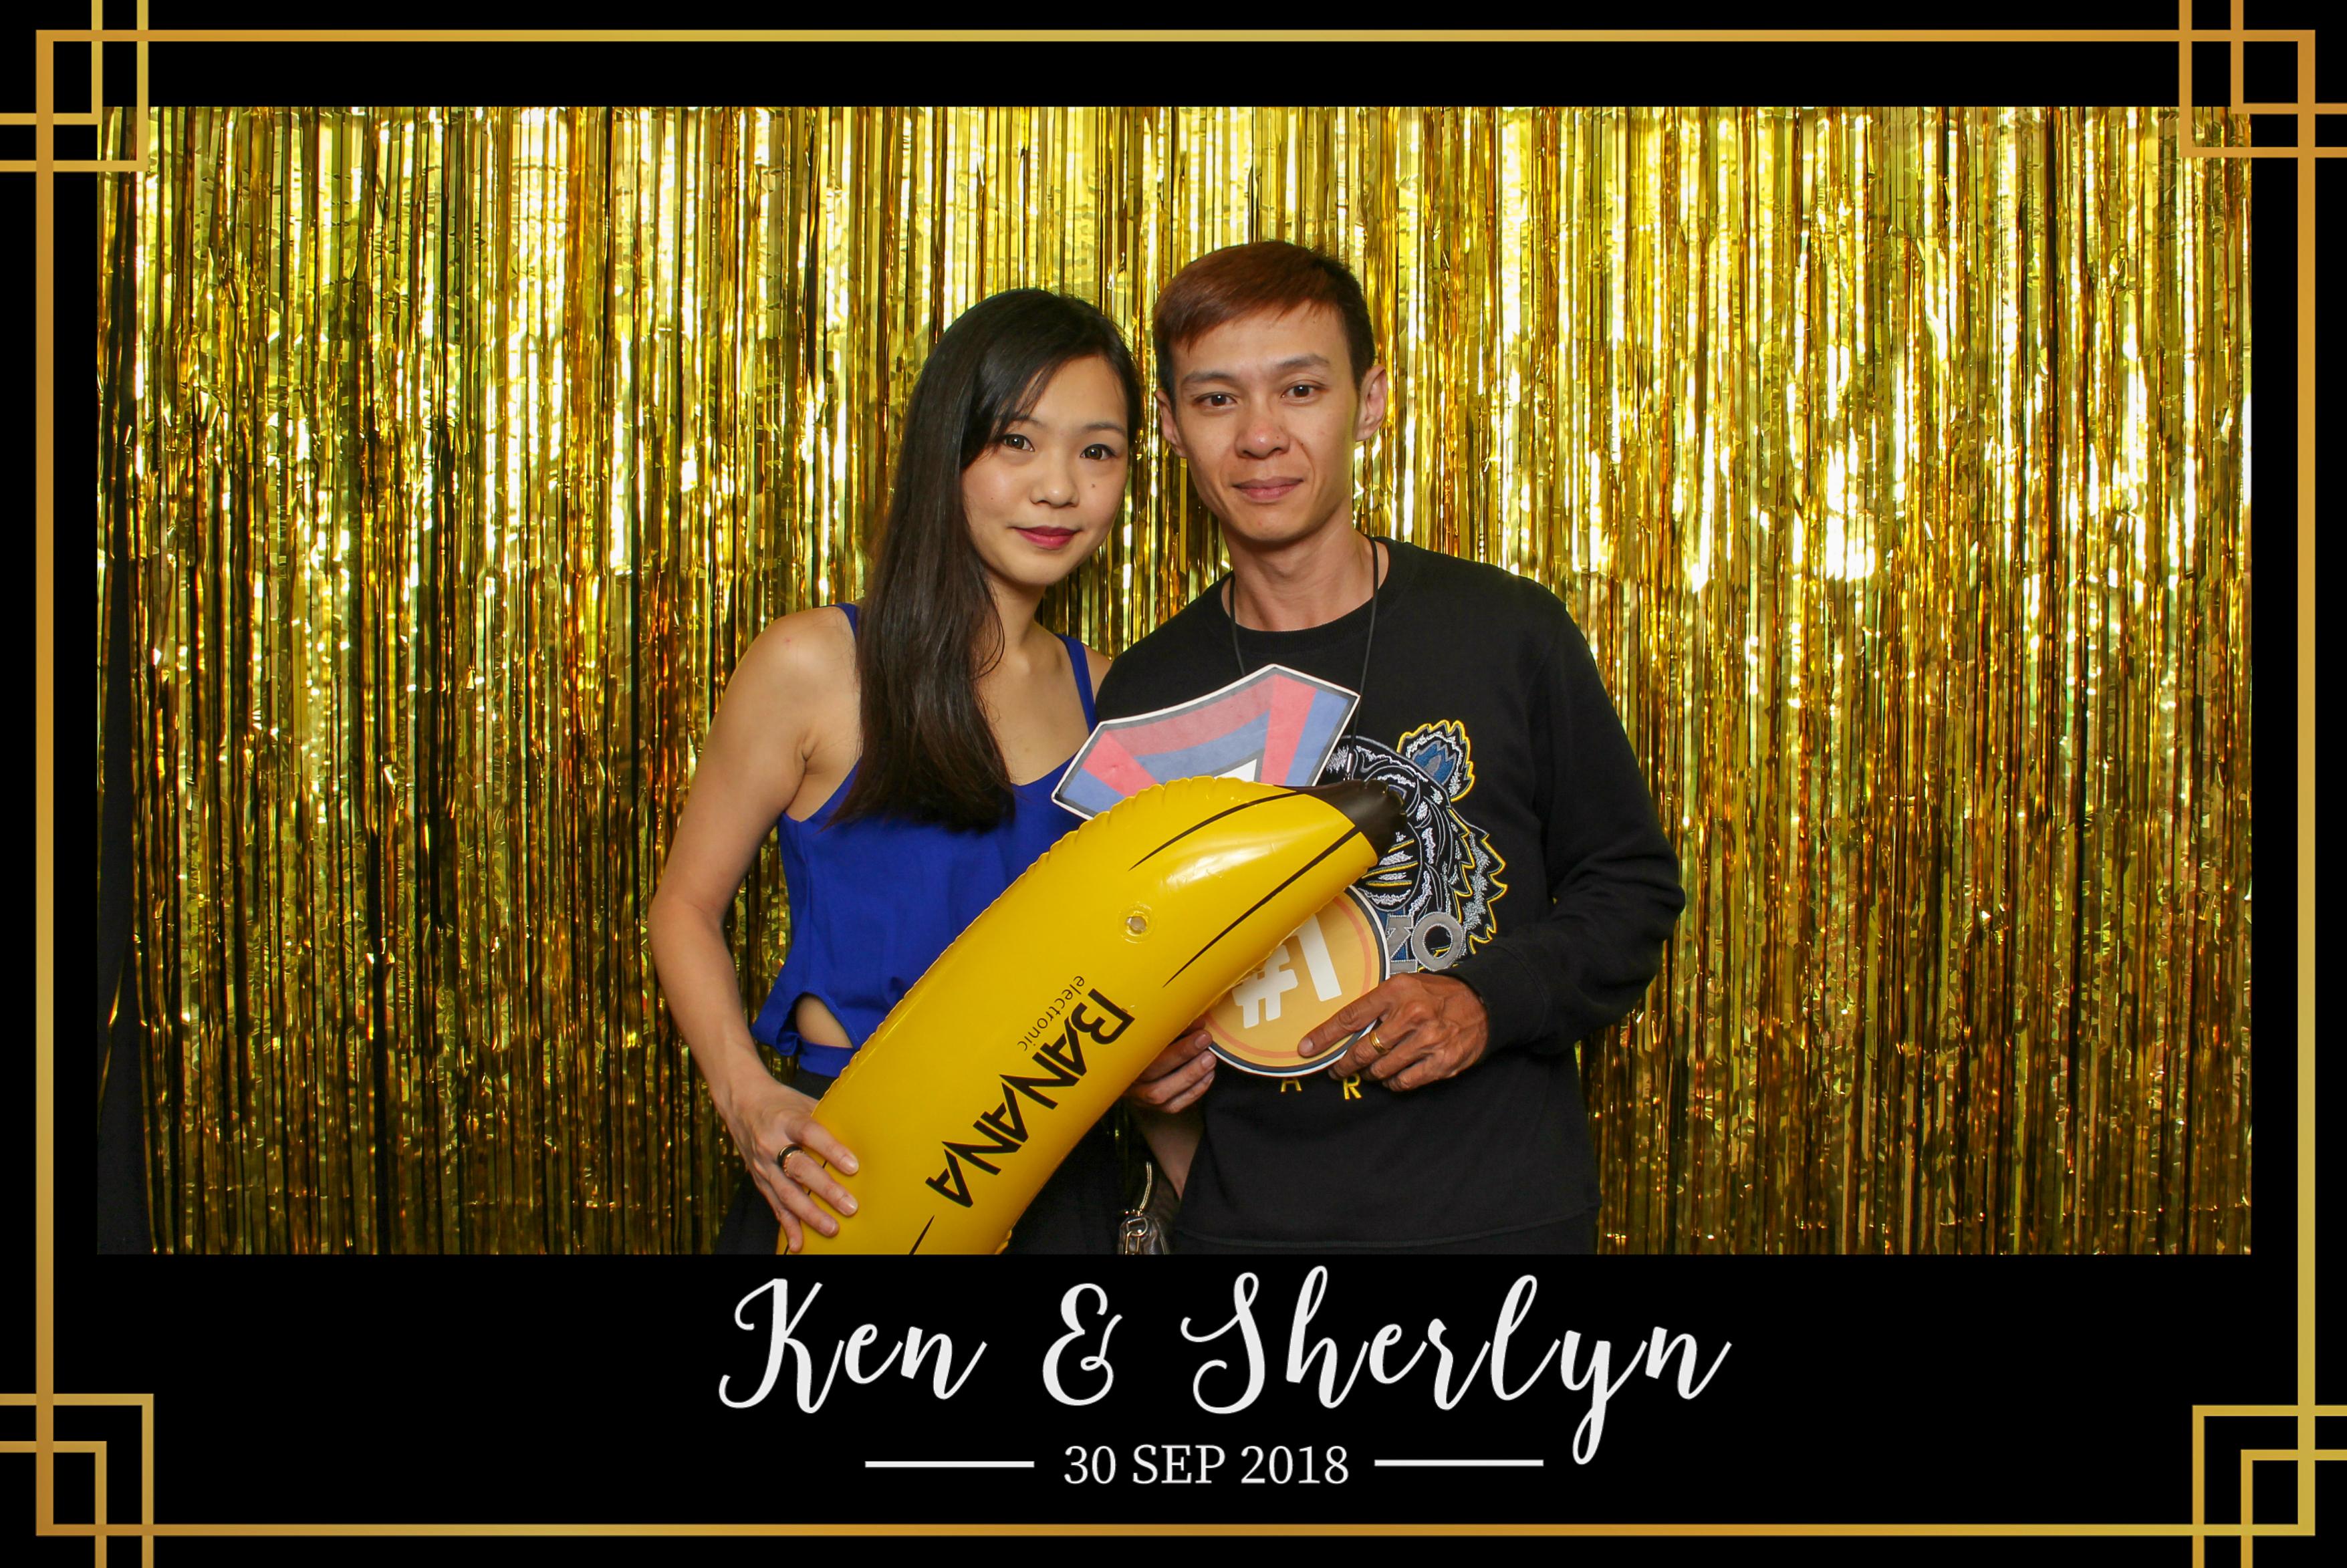 Ken Sherlyn wedding photo booth (33)